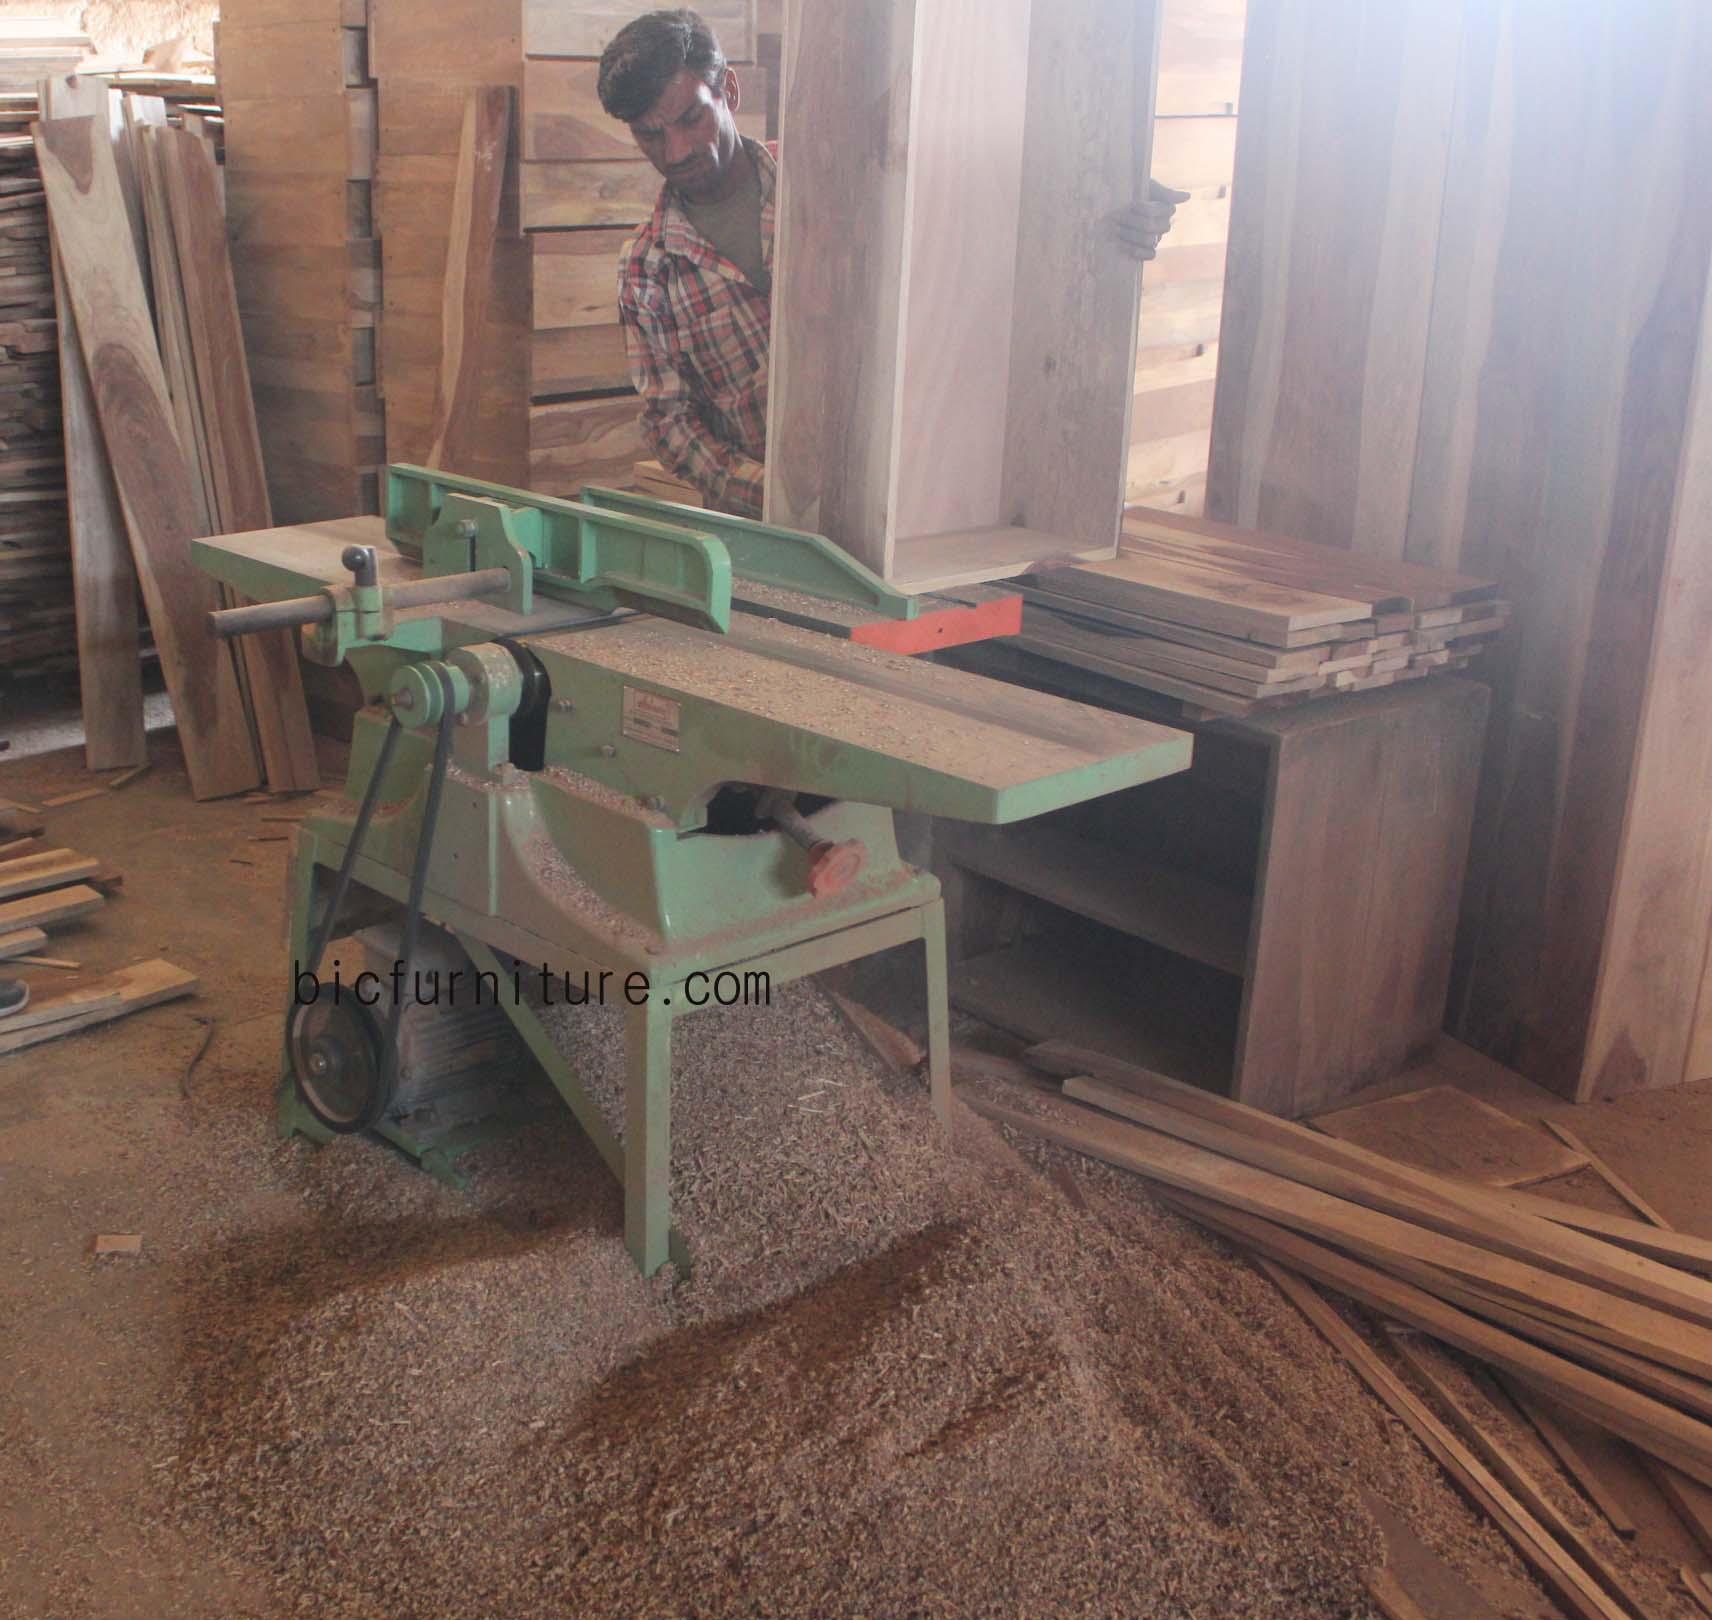 Sofa Manufacturing Process In India